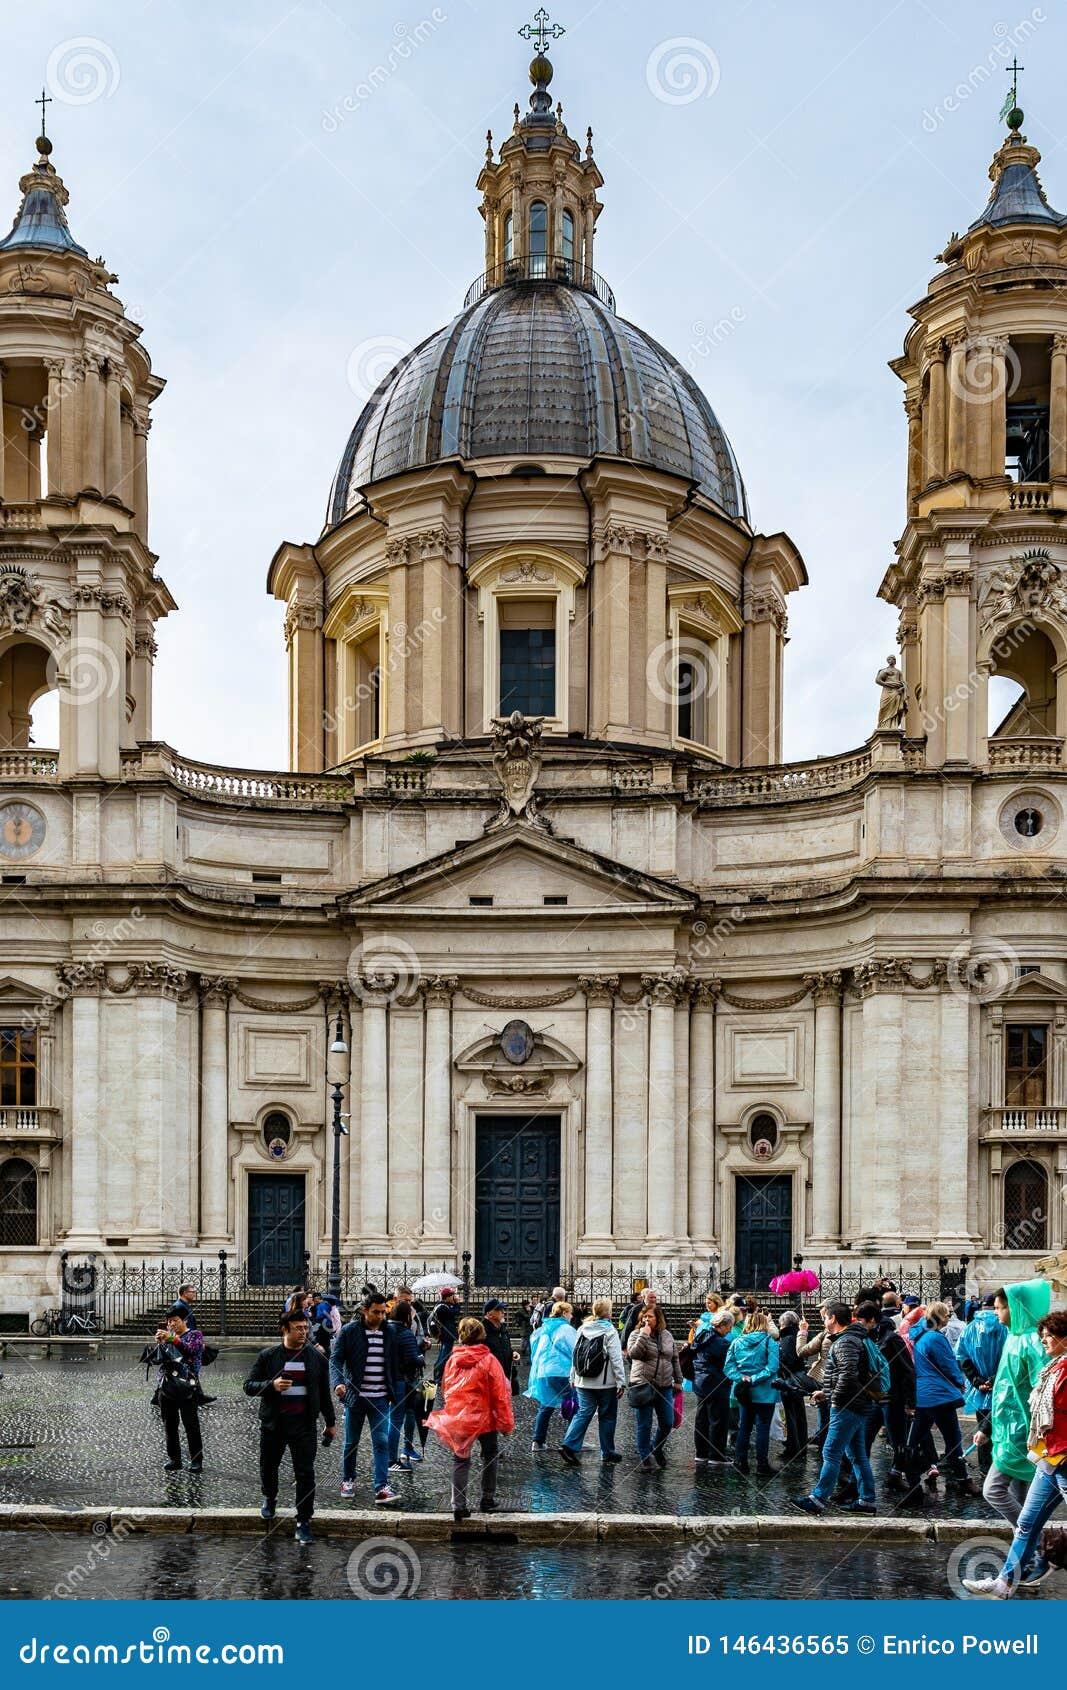 Sant 'Agnese in Agone auch genanntem Sant 'Agnese im Marktplatz Navona eine barocke Kirche des 17. Jahrhunderts in Rom